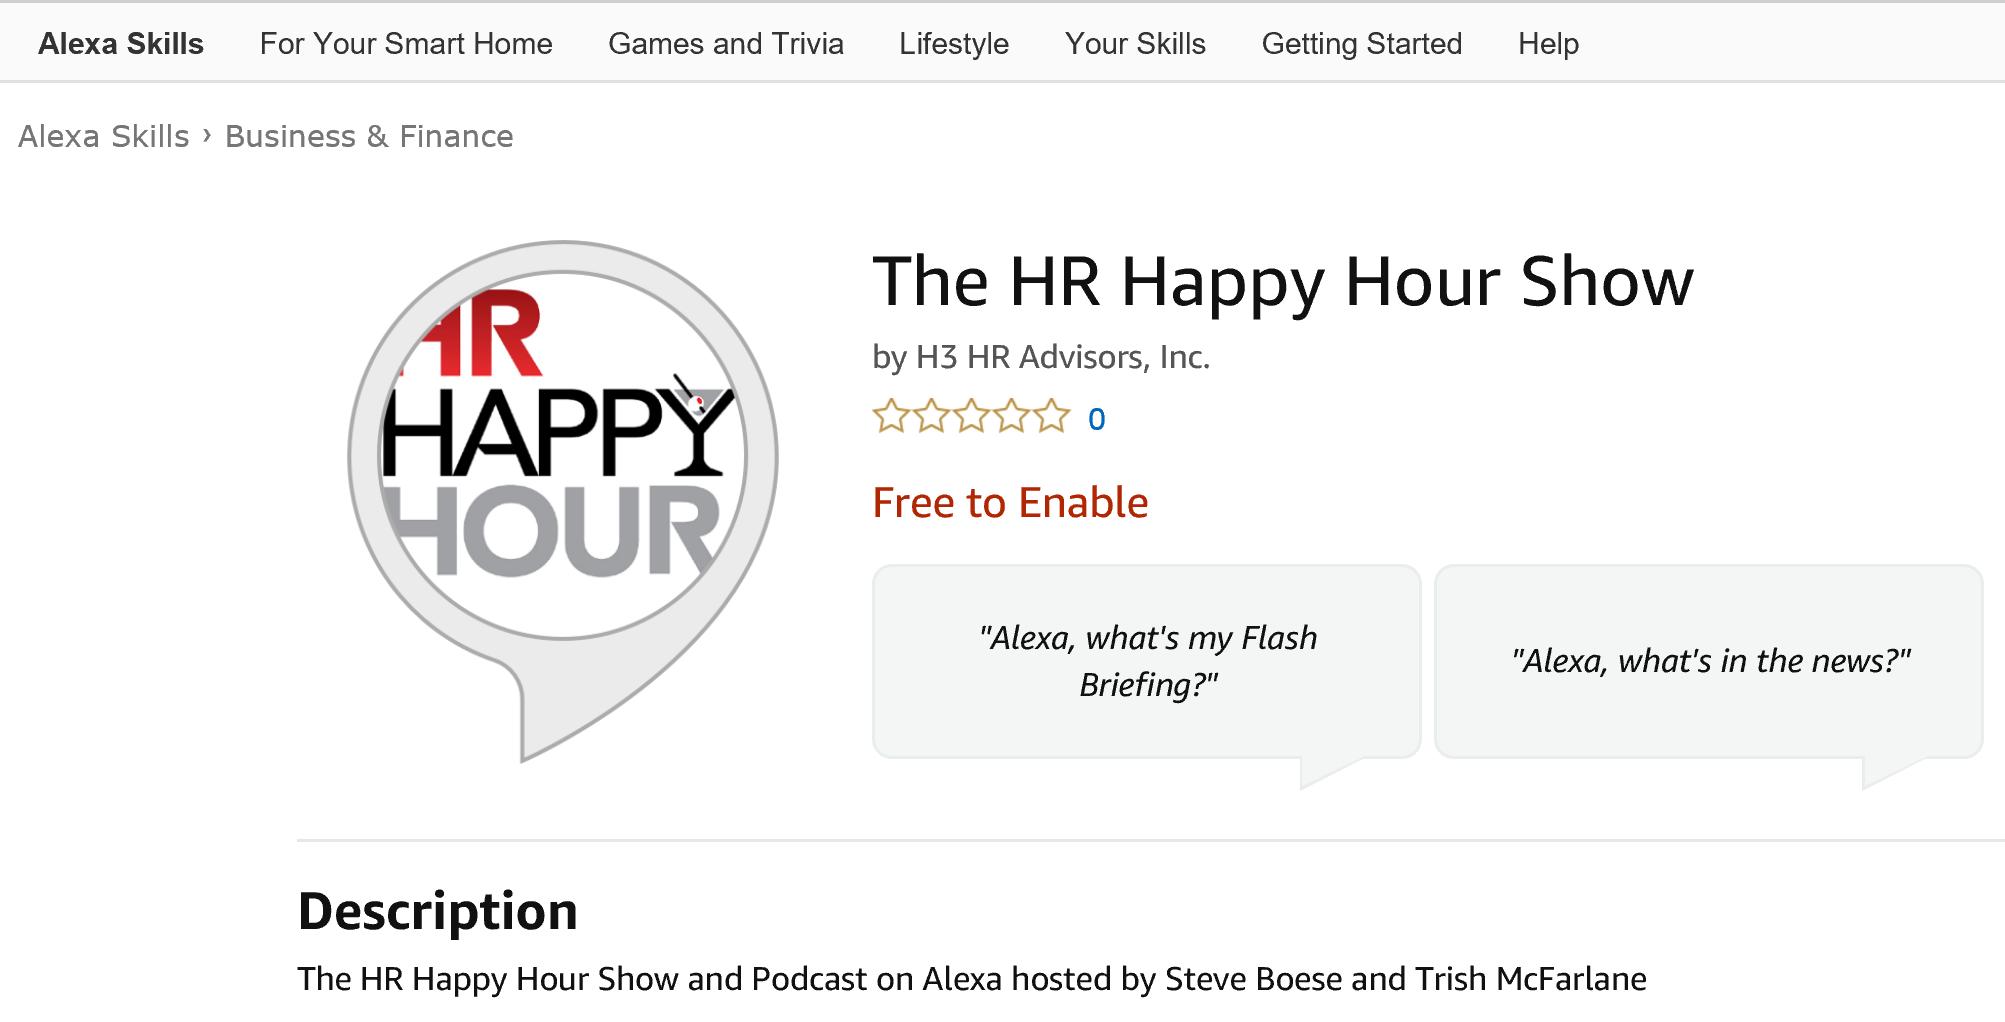 ANNOUNCEMENT: The HR Happy Hour Show on Amazon Alexa